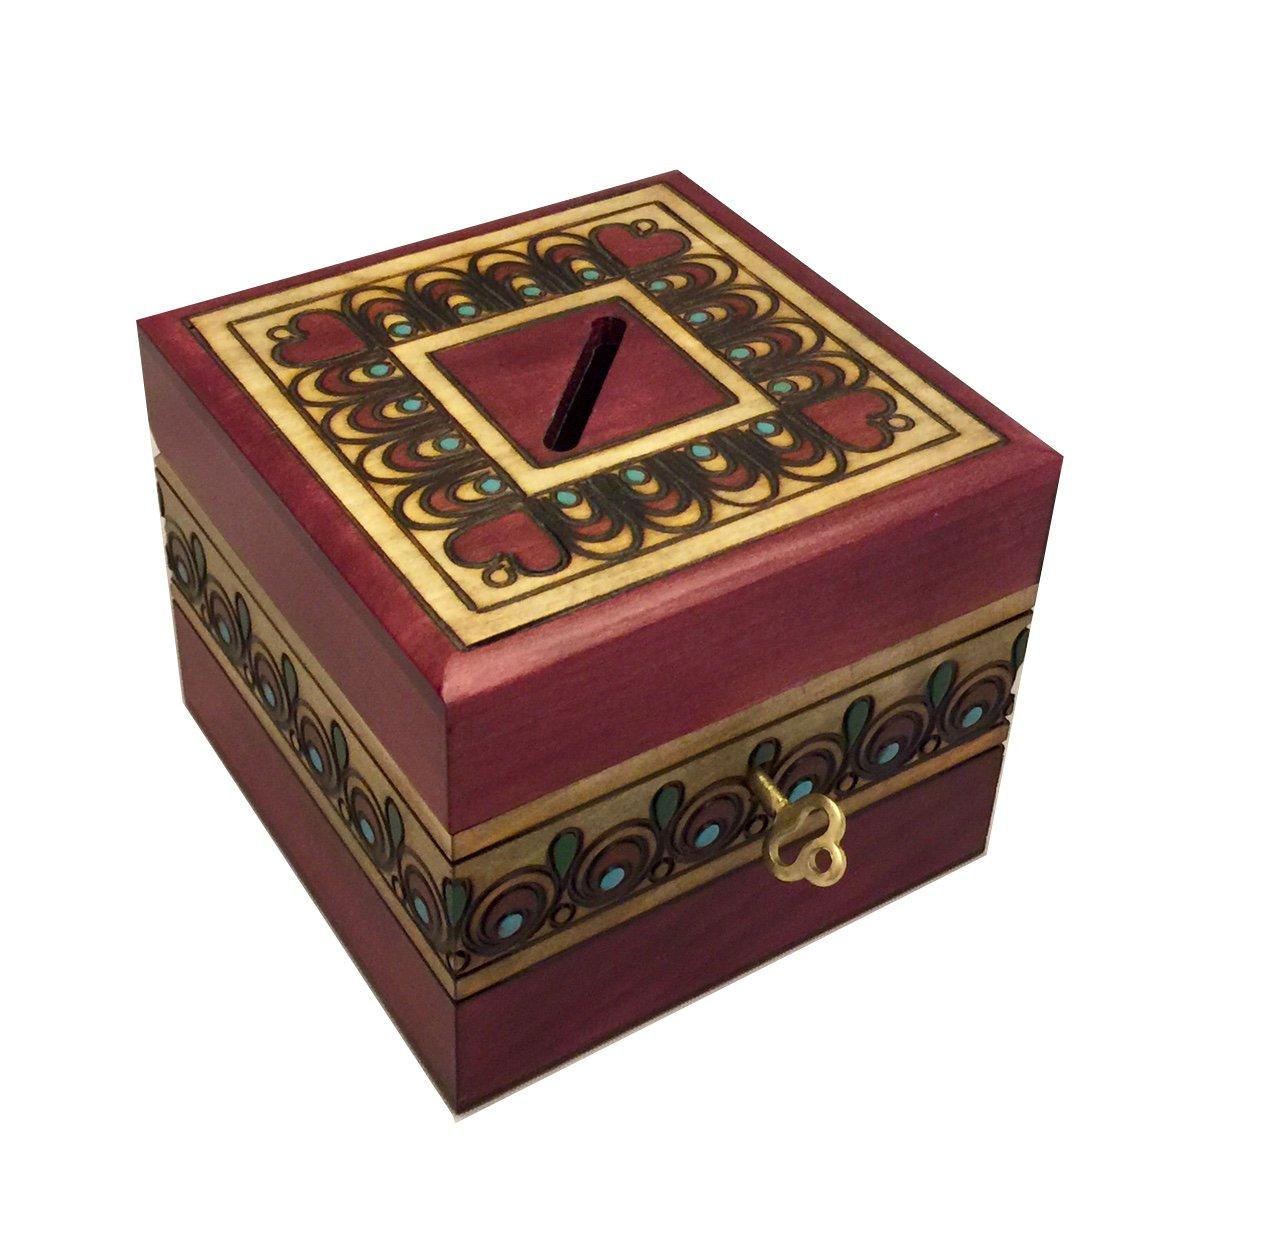 Wooden SAVINGS BANK BOX with Lock and Key Polish Handmade Linden Wood Piggy Money Bank Unique Keepsake Gift   B072Q6H6W1